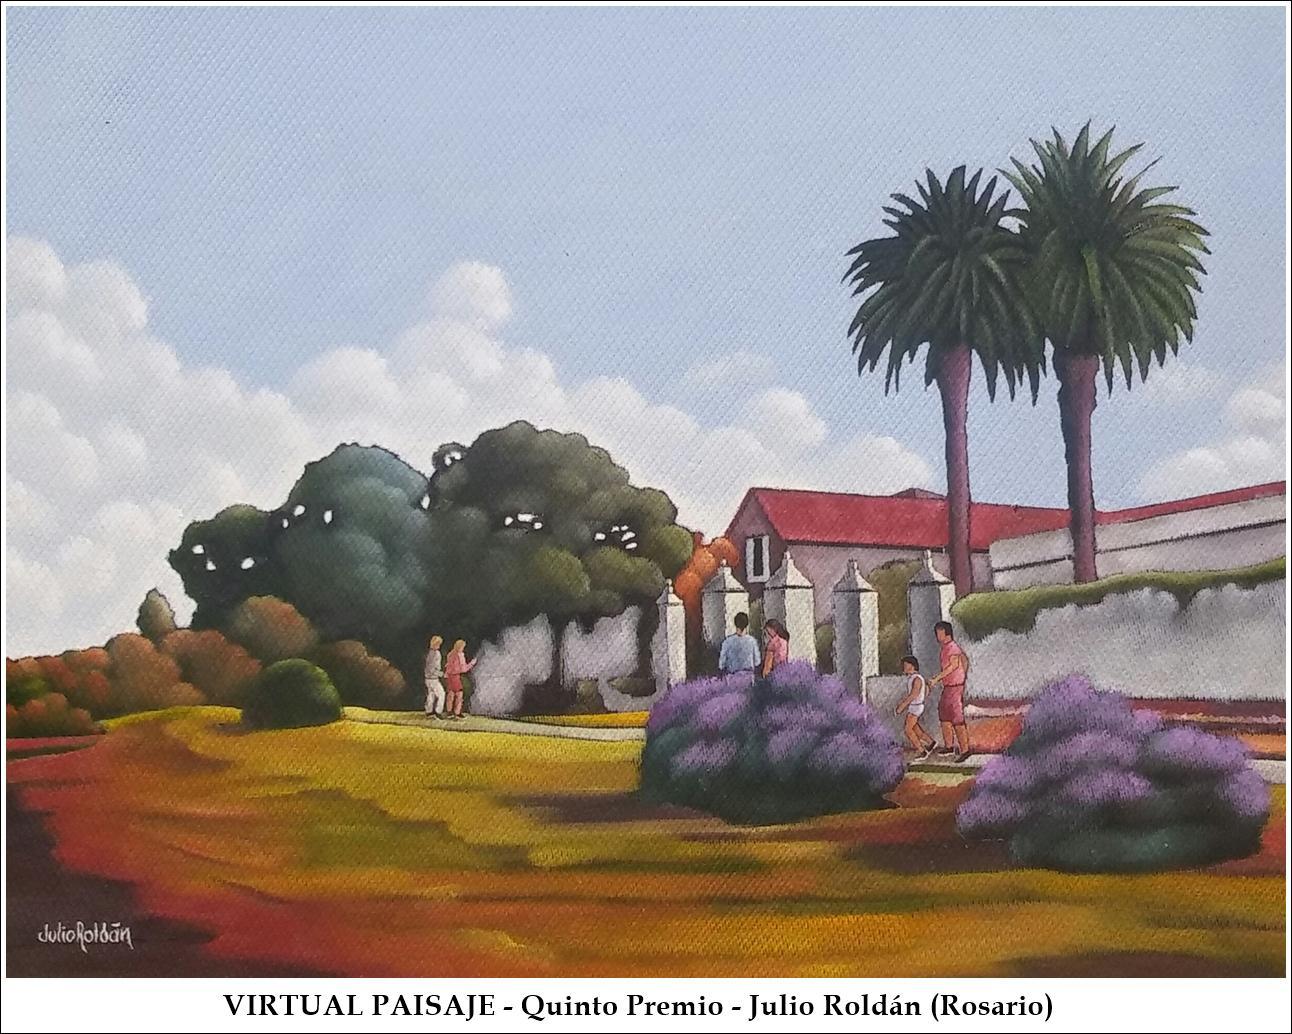 VirtualPaisaje - QuintoPremio - Julio Roldan